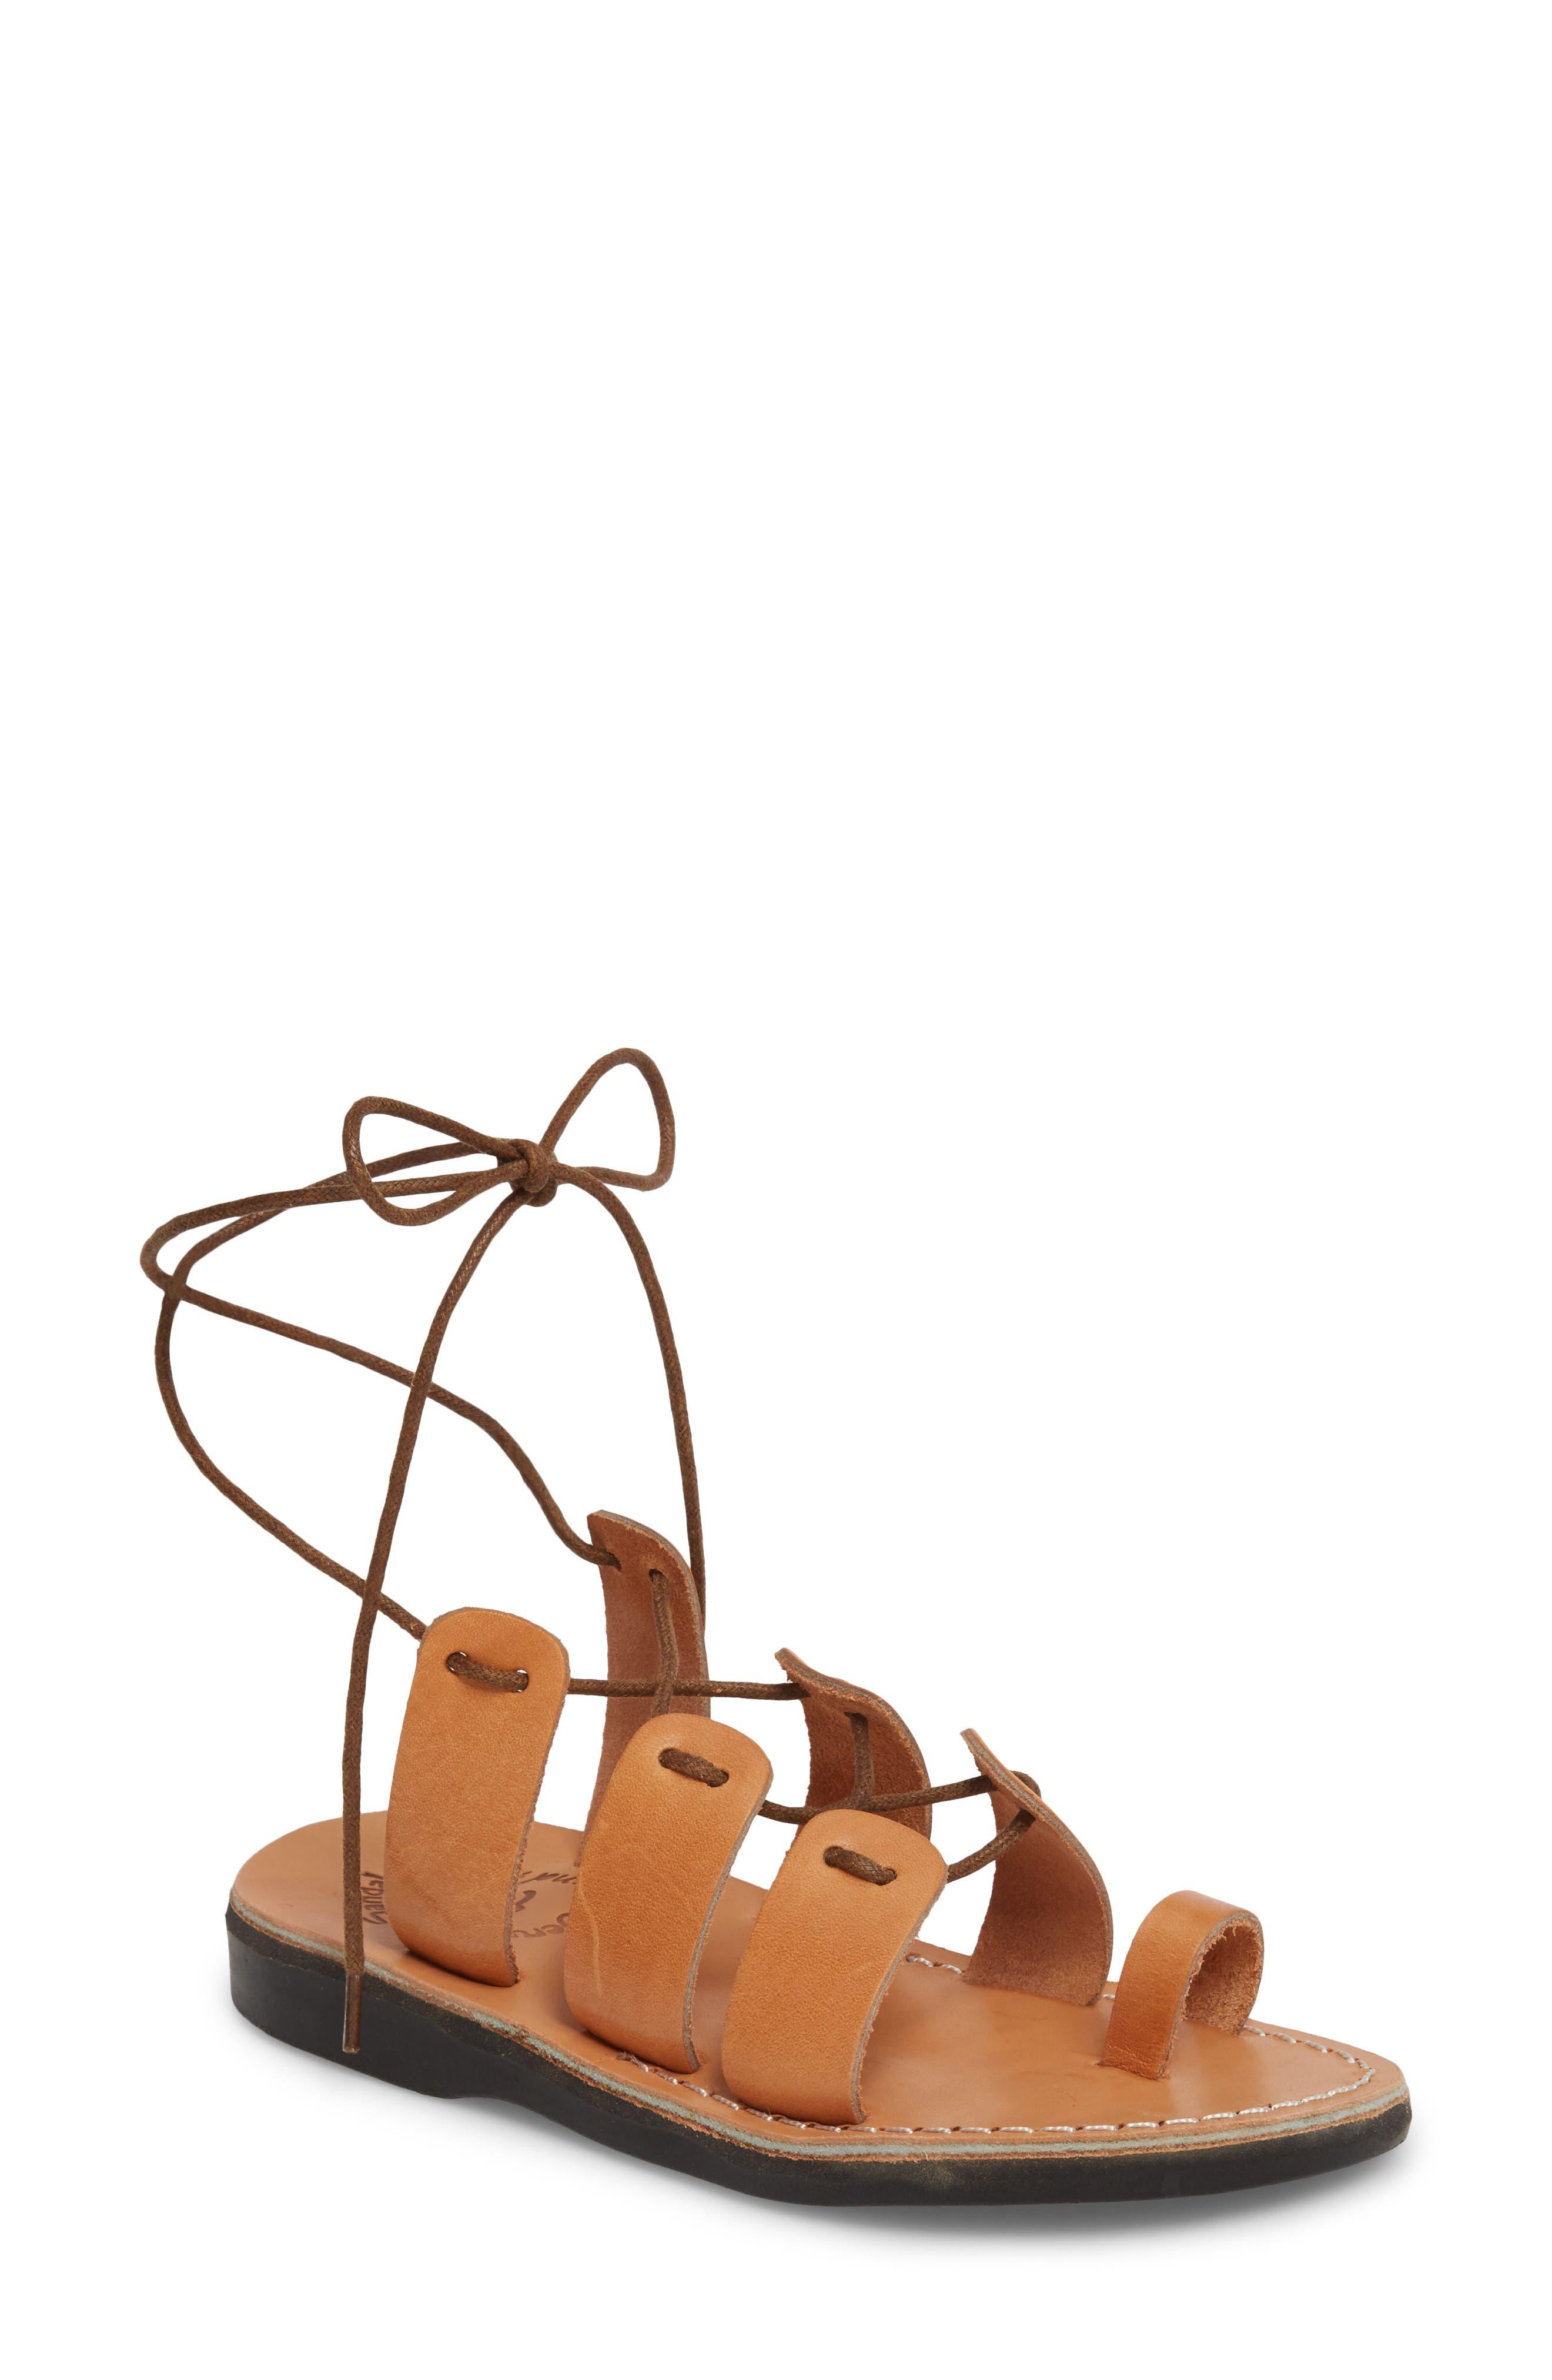 Main Image - Jerusalem Sandals Deborah Wraparound Laces Sandal (Women)